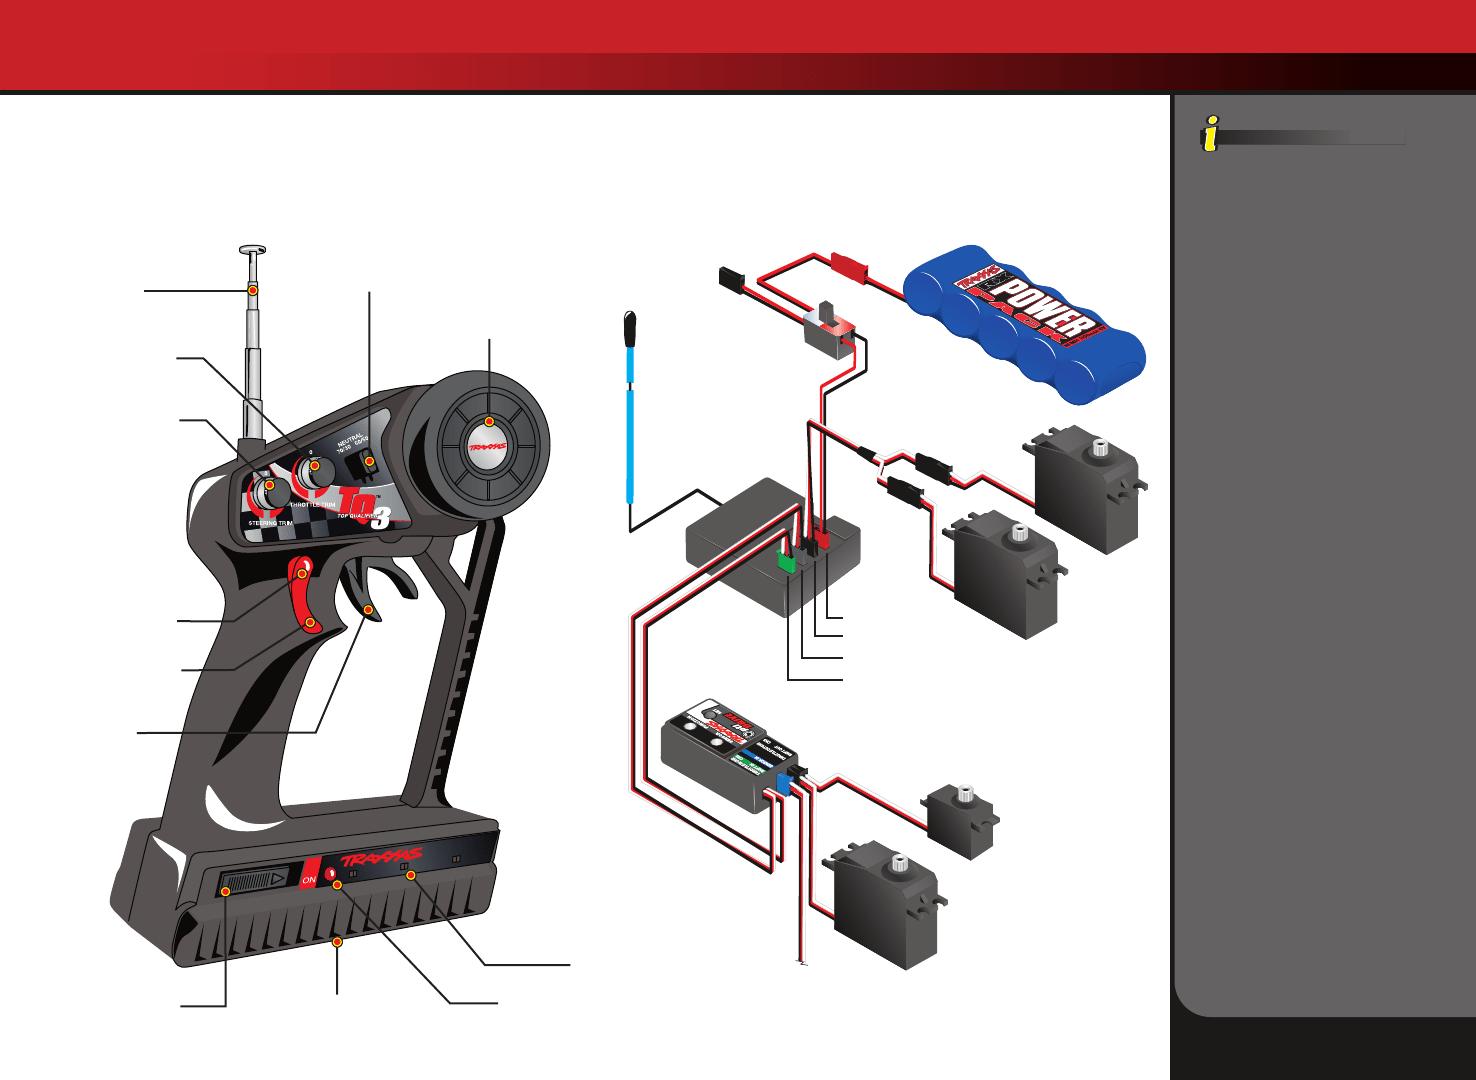 hight resolution of revo 3 3 wiring diagram wiring diagram info revo 3 3 wiring diagram revo 3 3 wiring